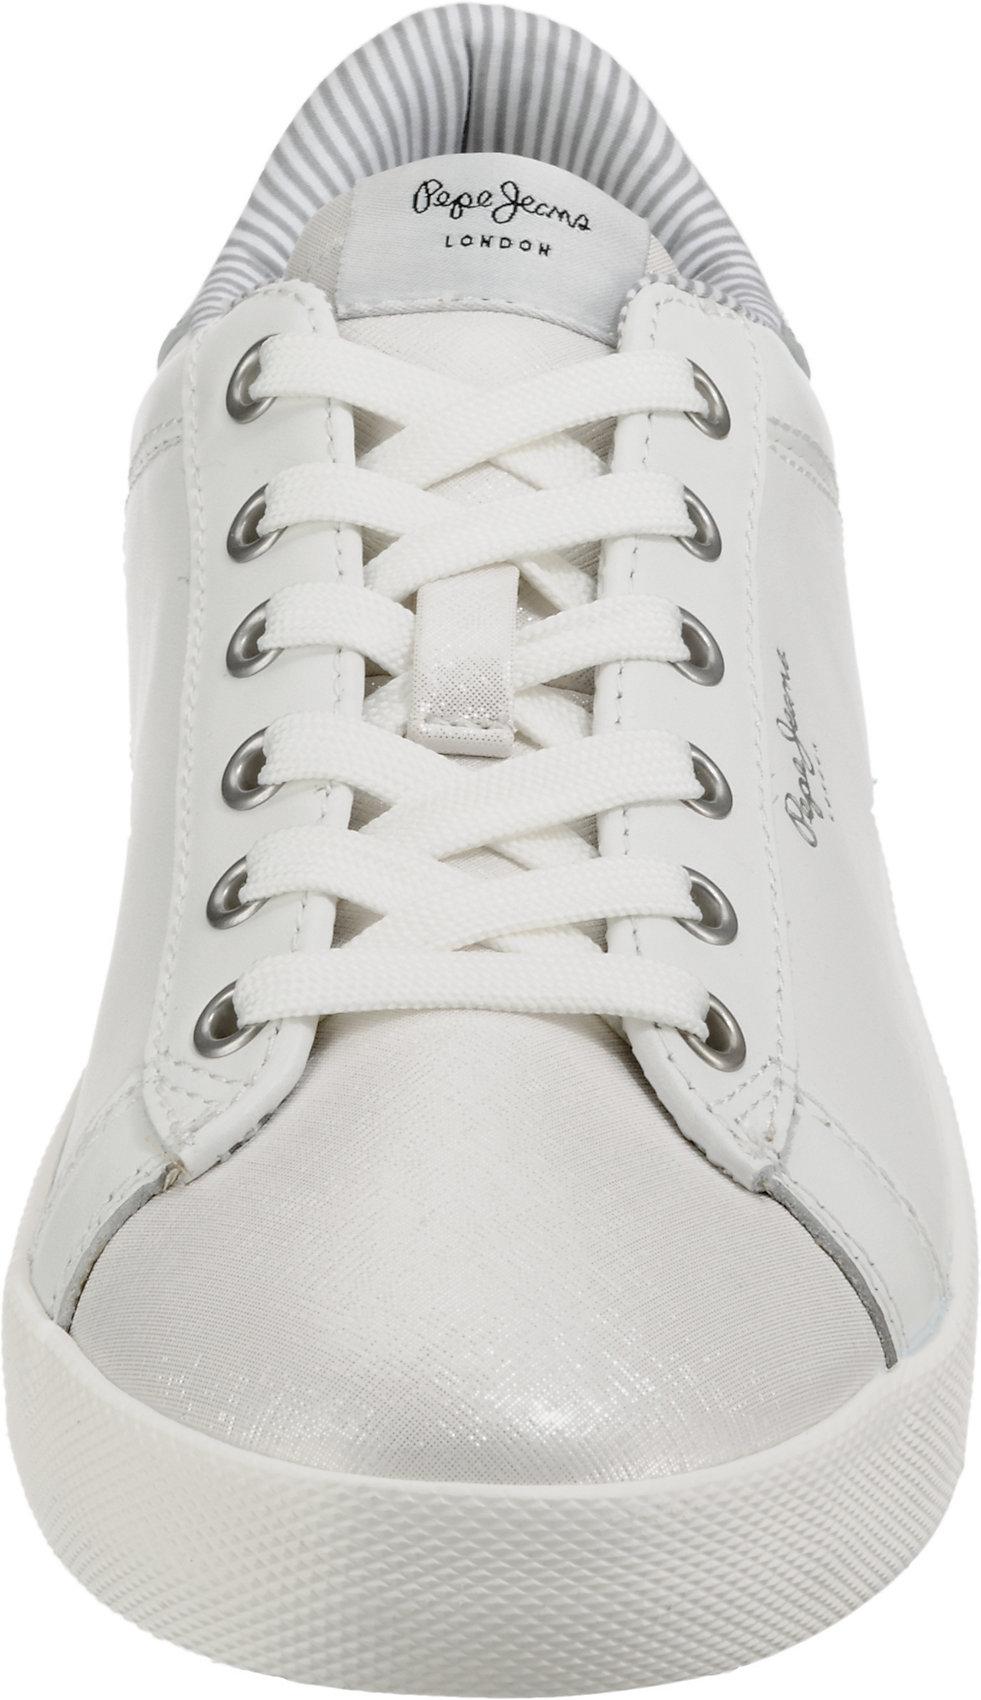 9566603 Pepe Weiß bronze Neu Low Jeans kombi Sneakers Weiß Damen Für PuOkXiTZ